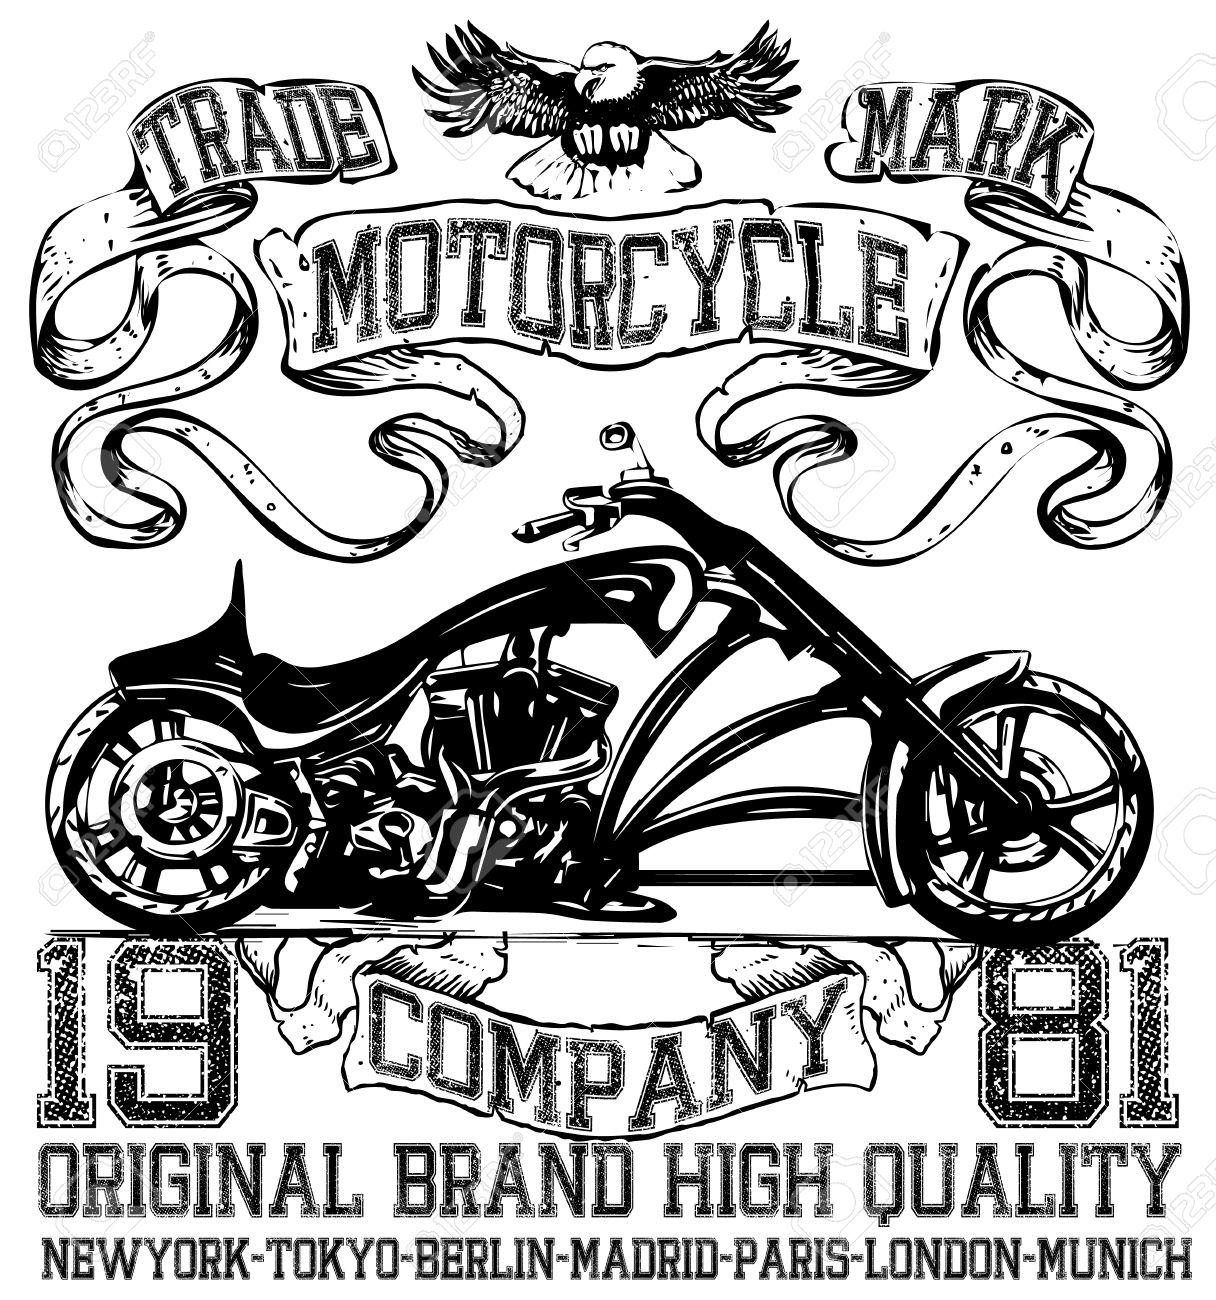 Shirt design london - Motorcycle Label T Shirt Design With Illustration Of Custom Chopper Stock Vector 52881424